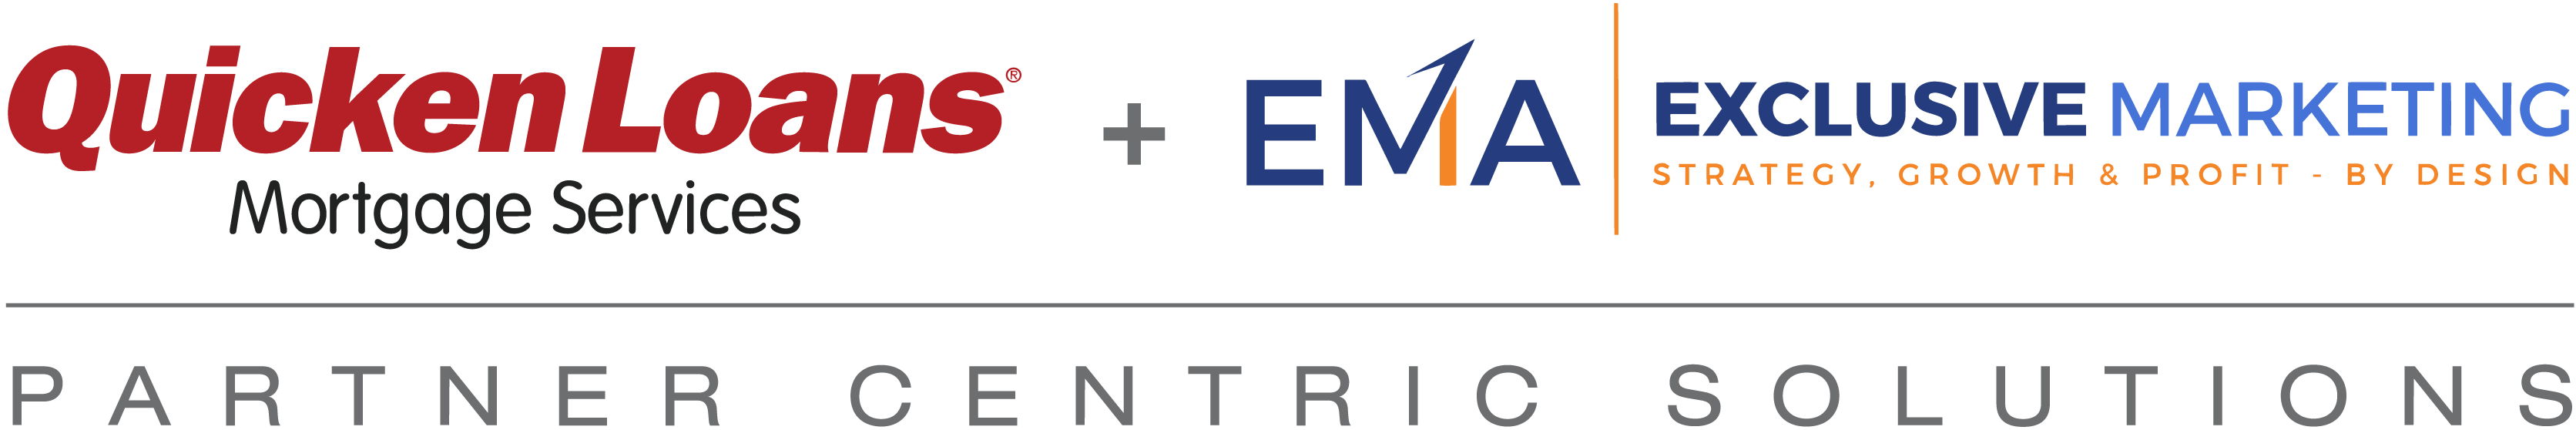 QL-EMA Logo 2-color